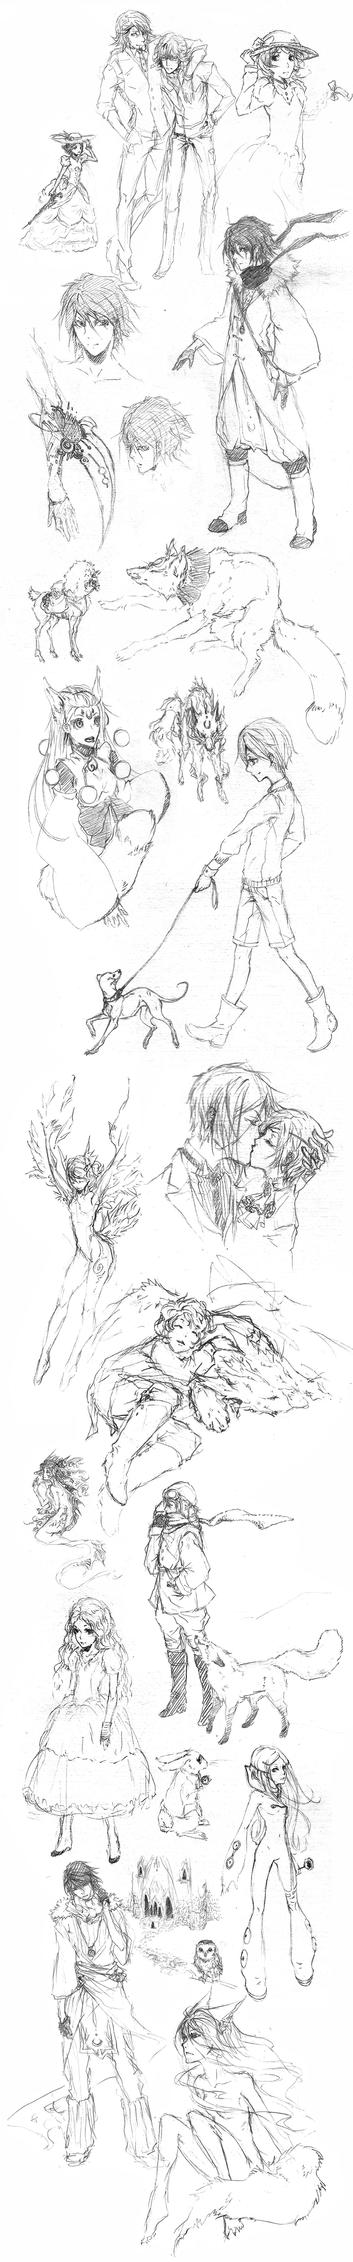 sketch dump 00 by Oinari-Hime